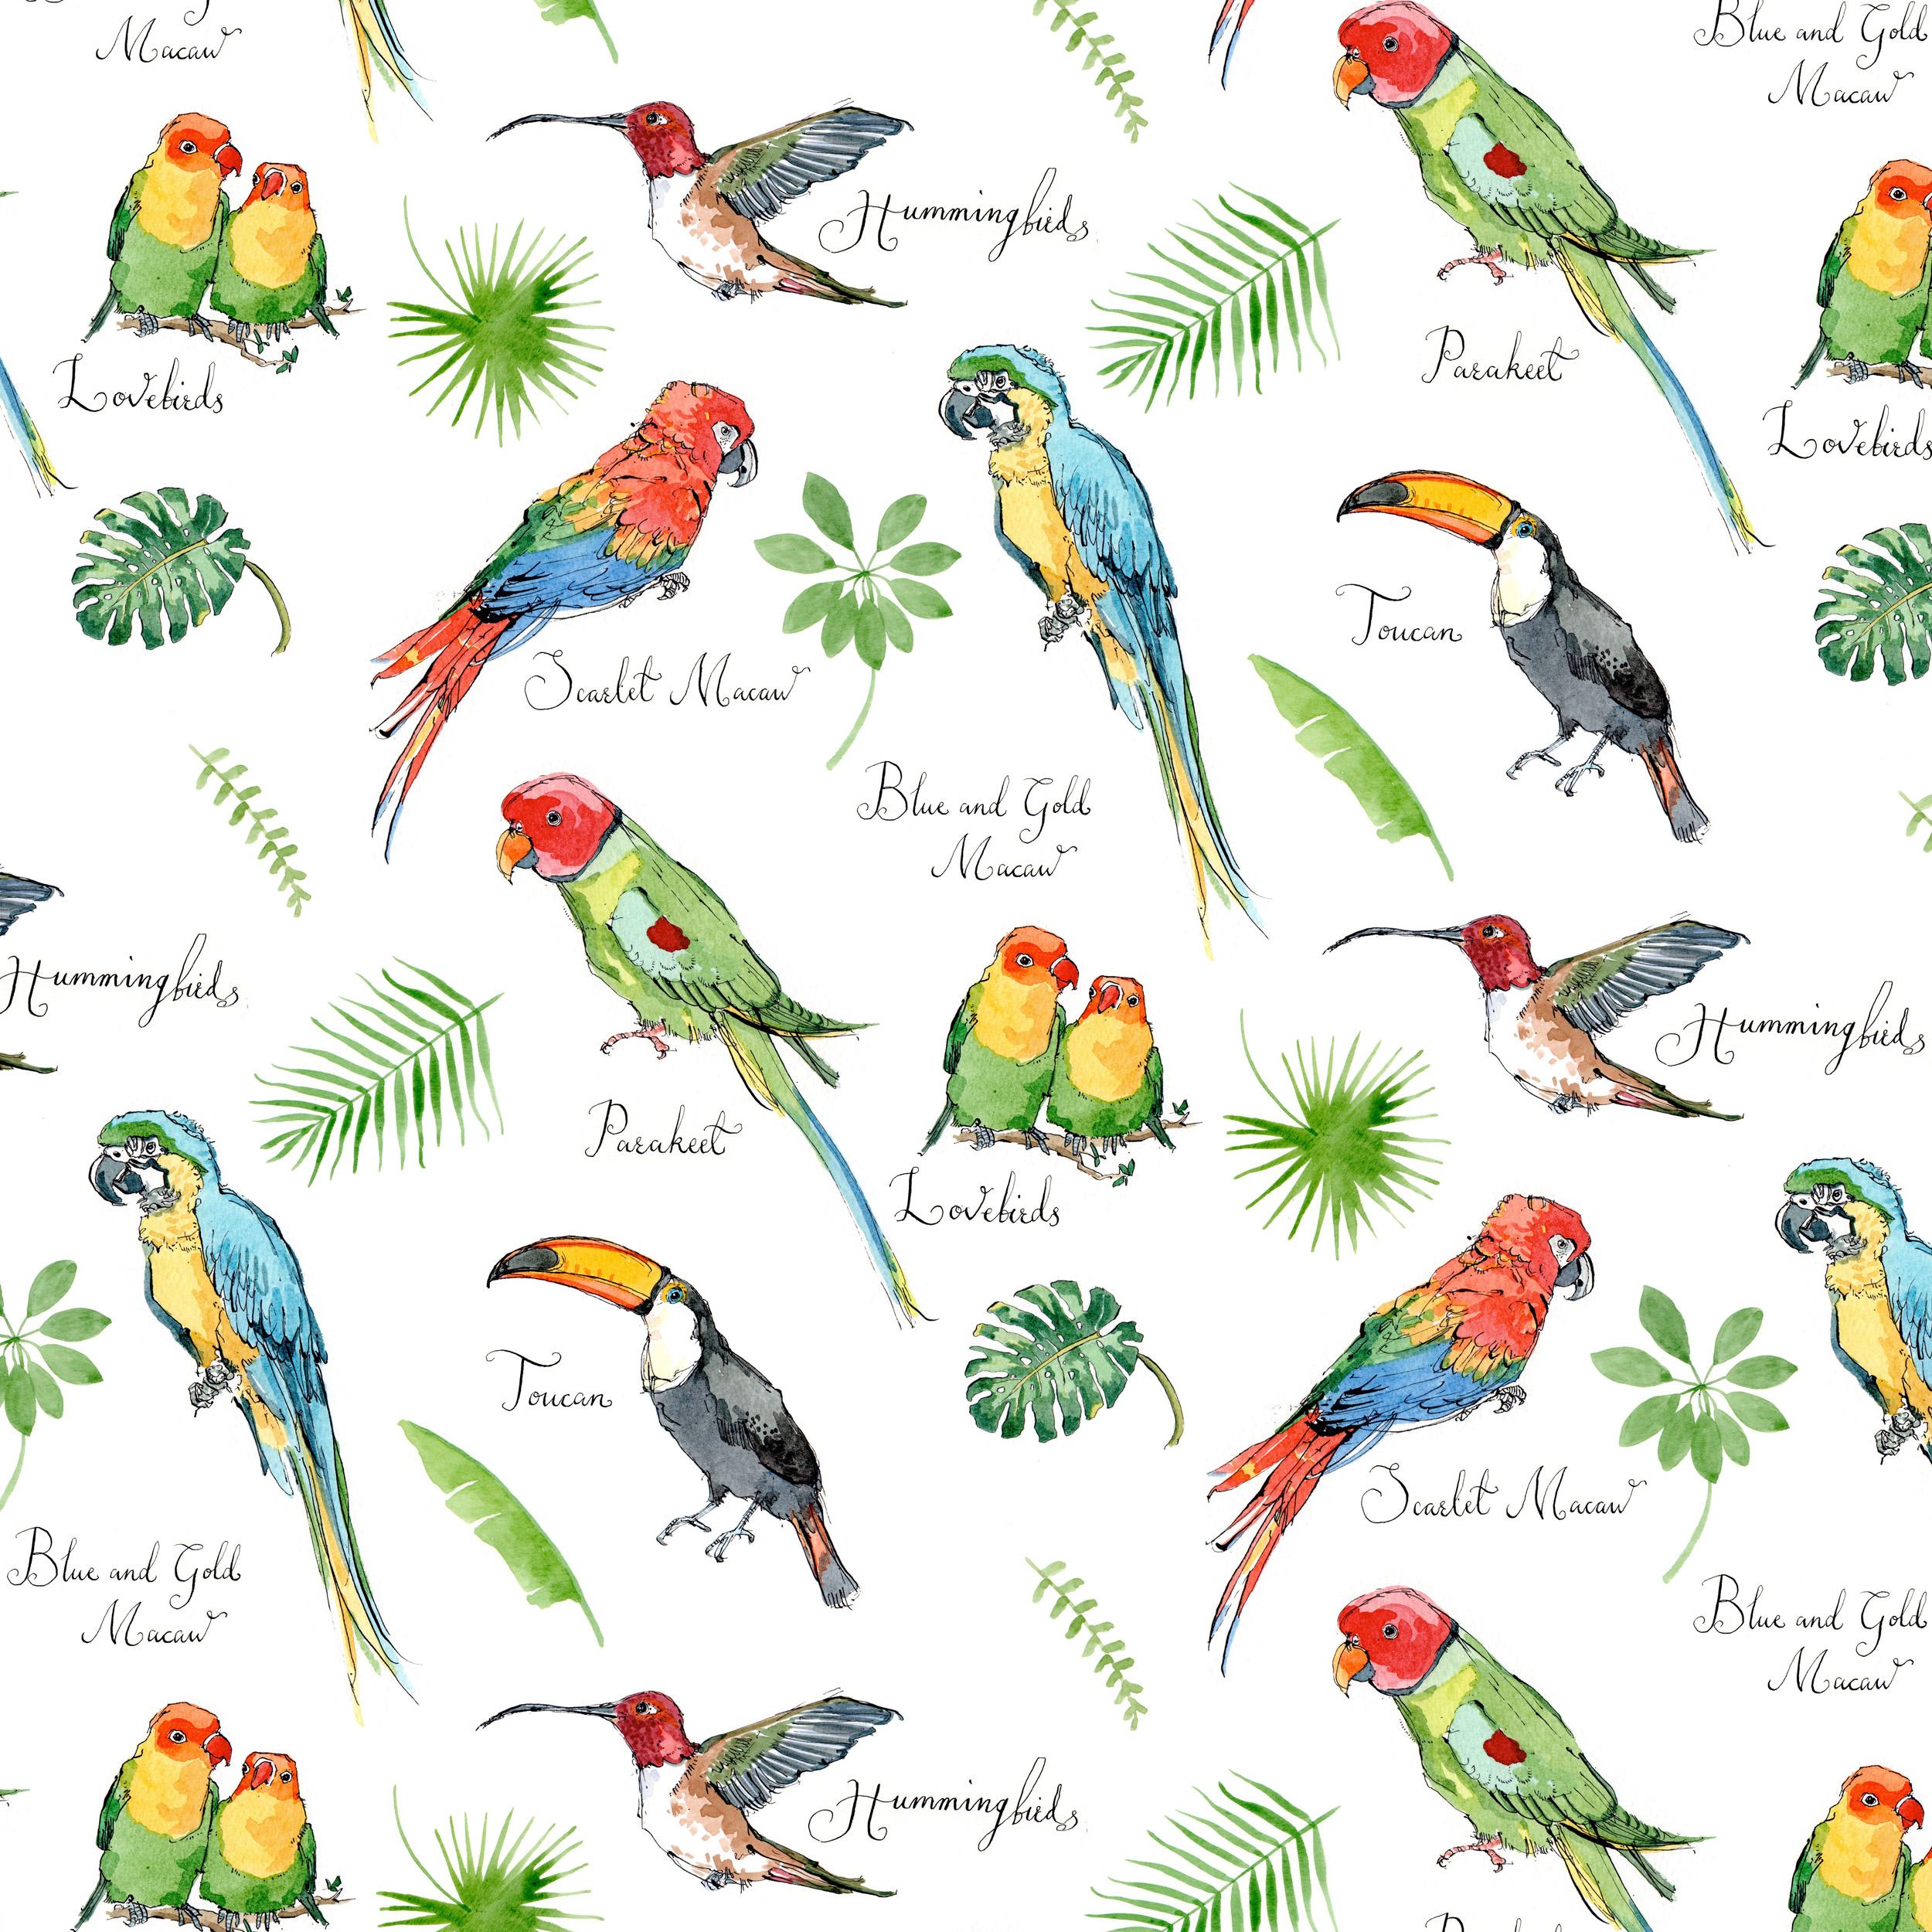 tropicalbirds.jpg